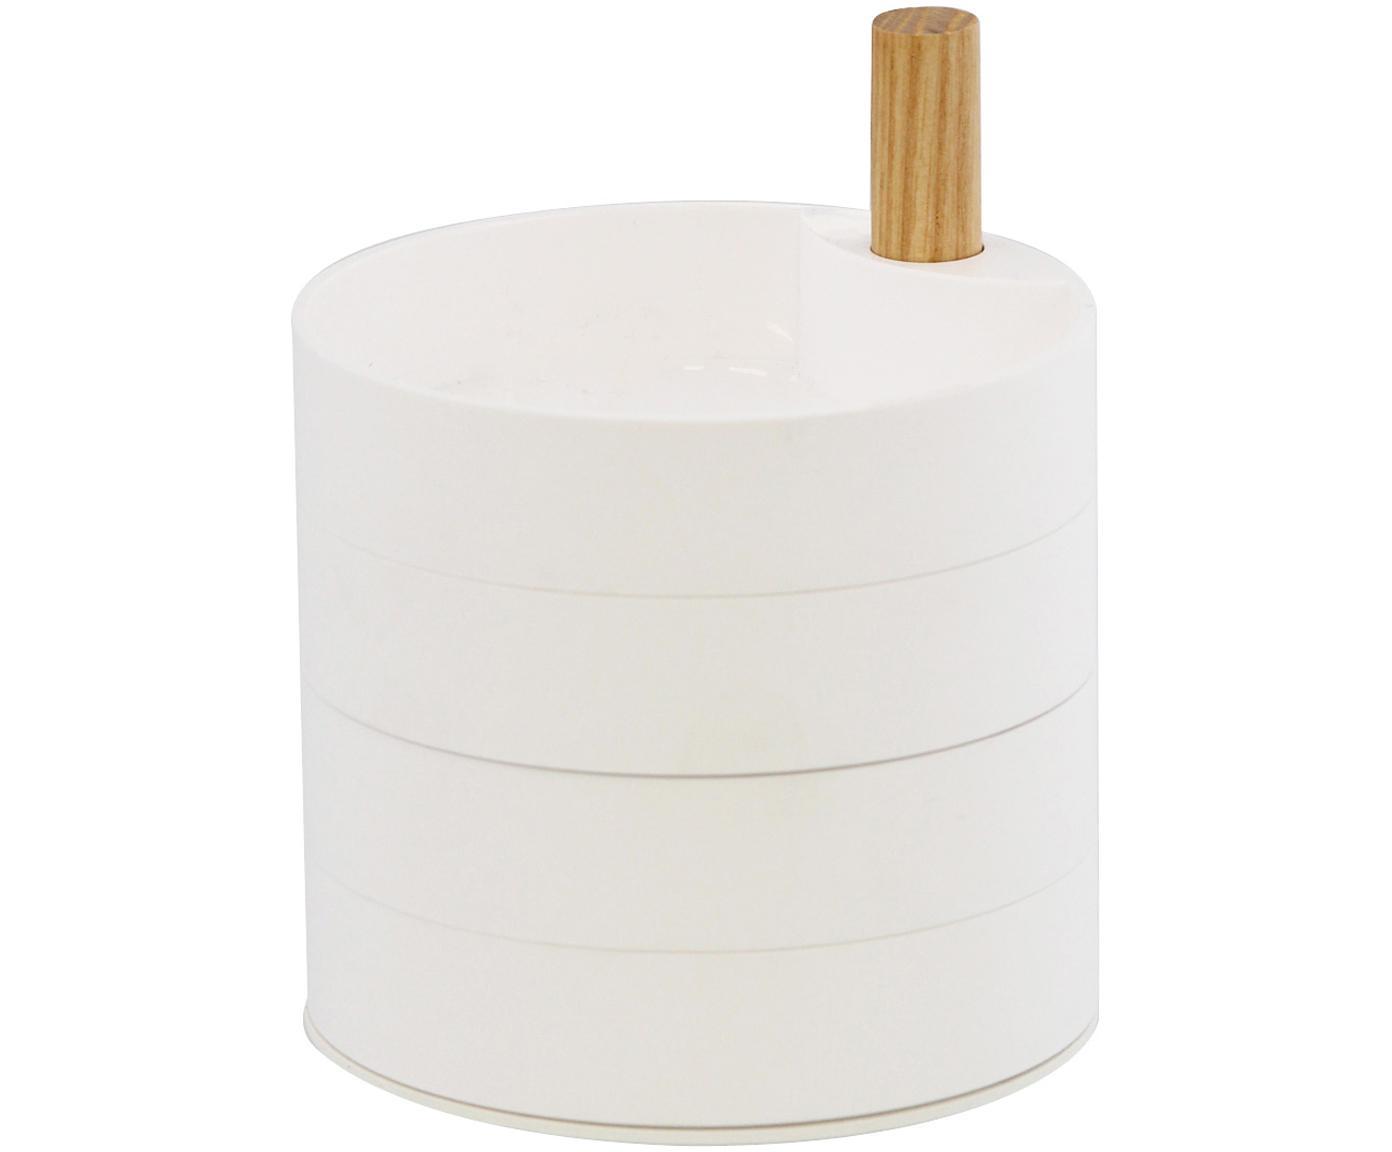 Portagioie Tosca, Asta: legno, Bianco, marrone, Larg. 10 x Alt. 12 cm